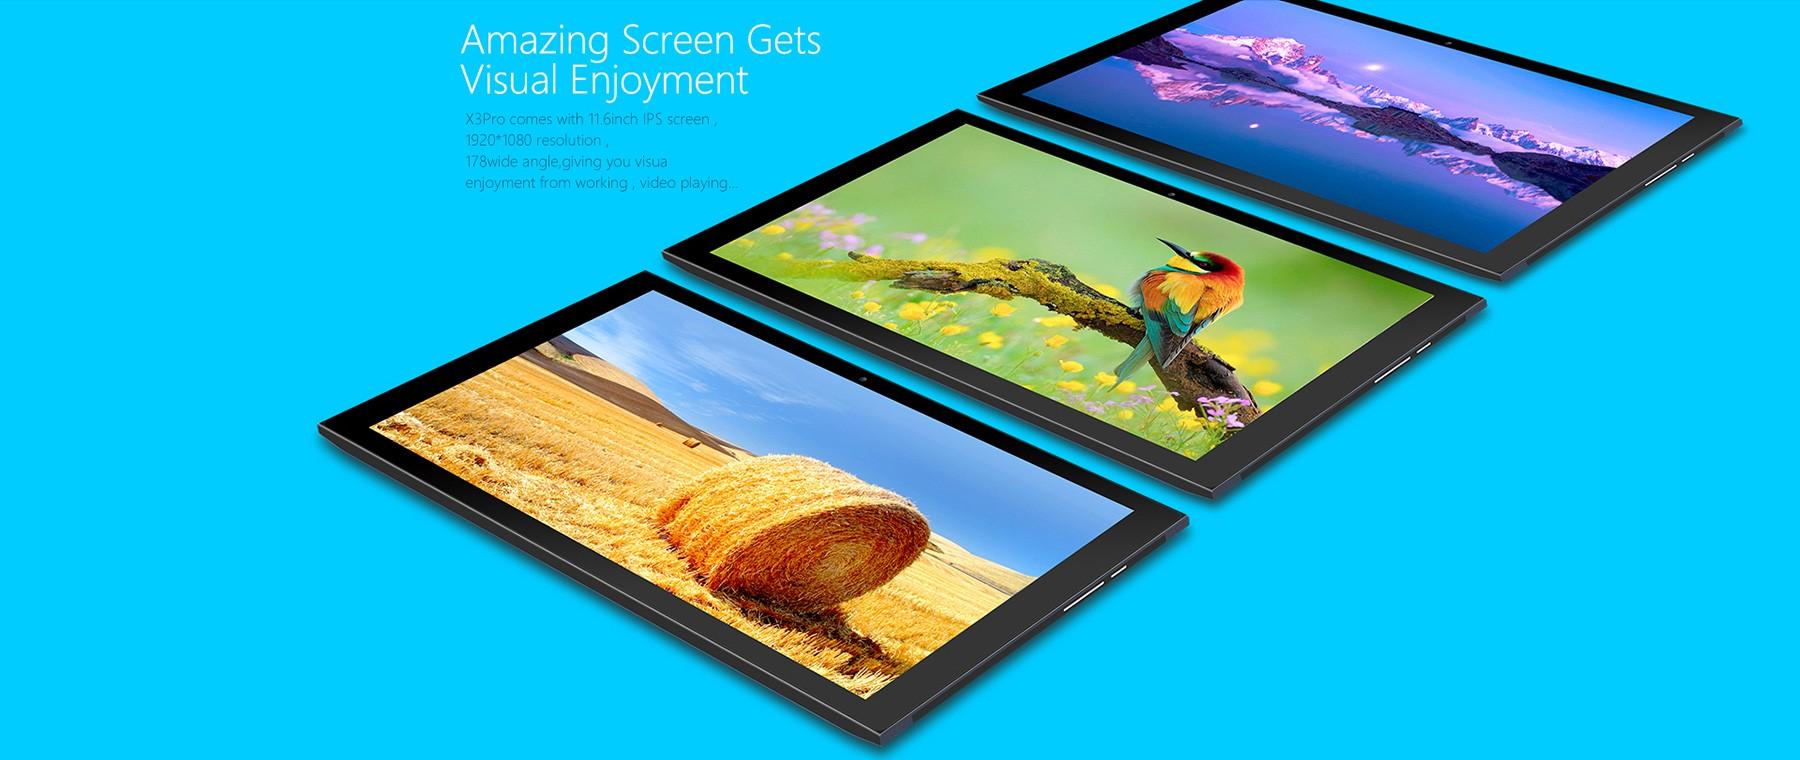 Teclast X3 Pro 2 in 1 Ultrabook Tablet PCレビュー 液晶のスペック参考画像